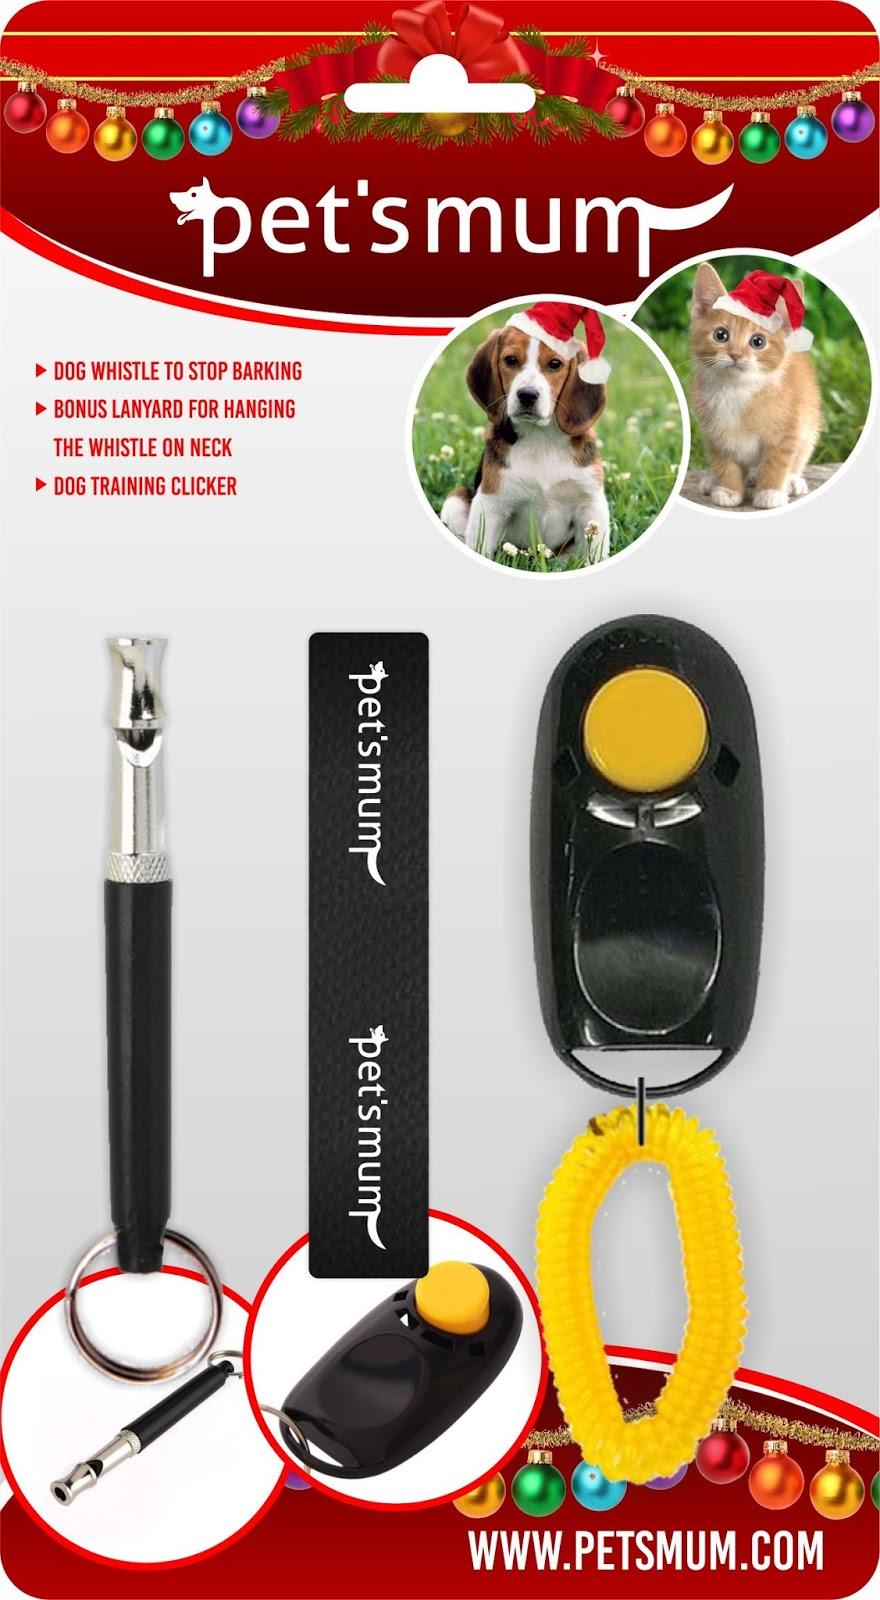 Simple Savings: Charming Christmas Gift with Dog Whistle and Pet ...